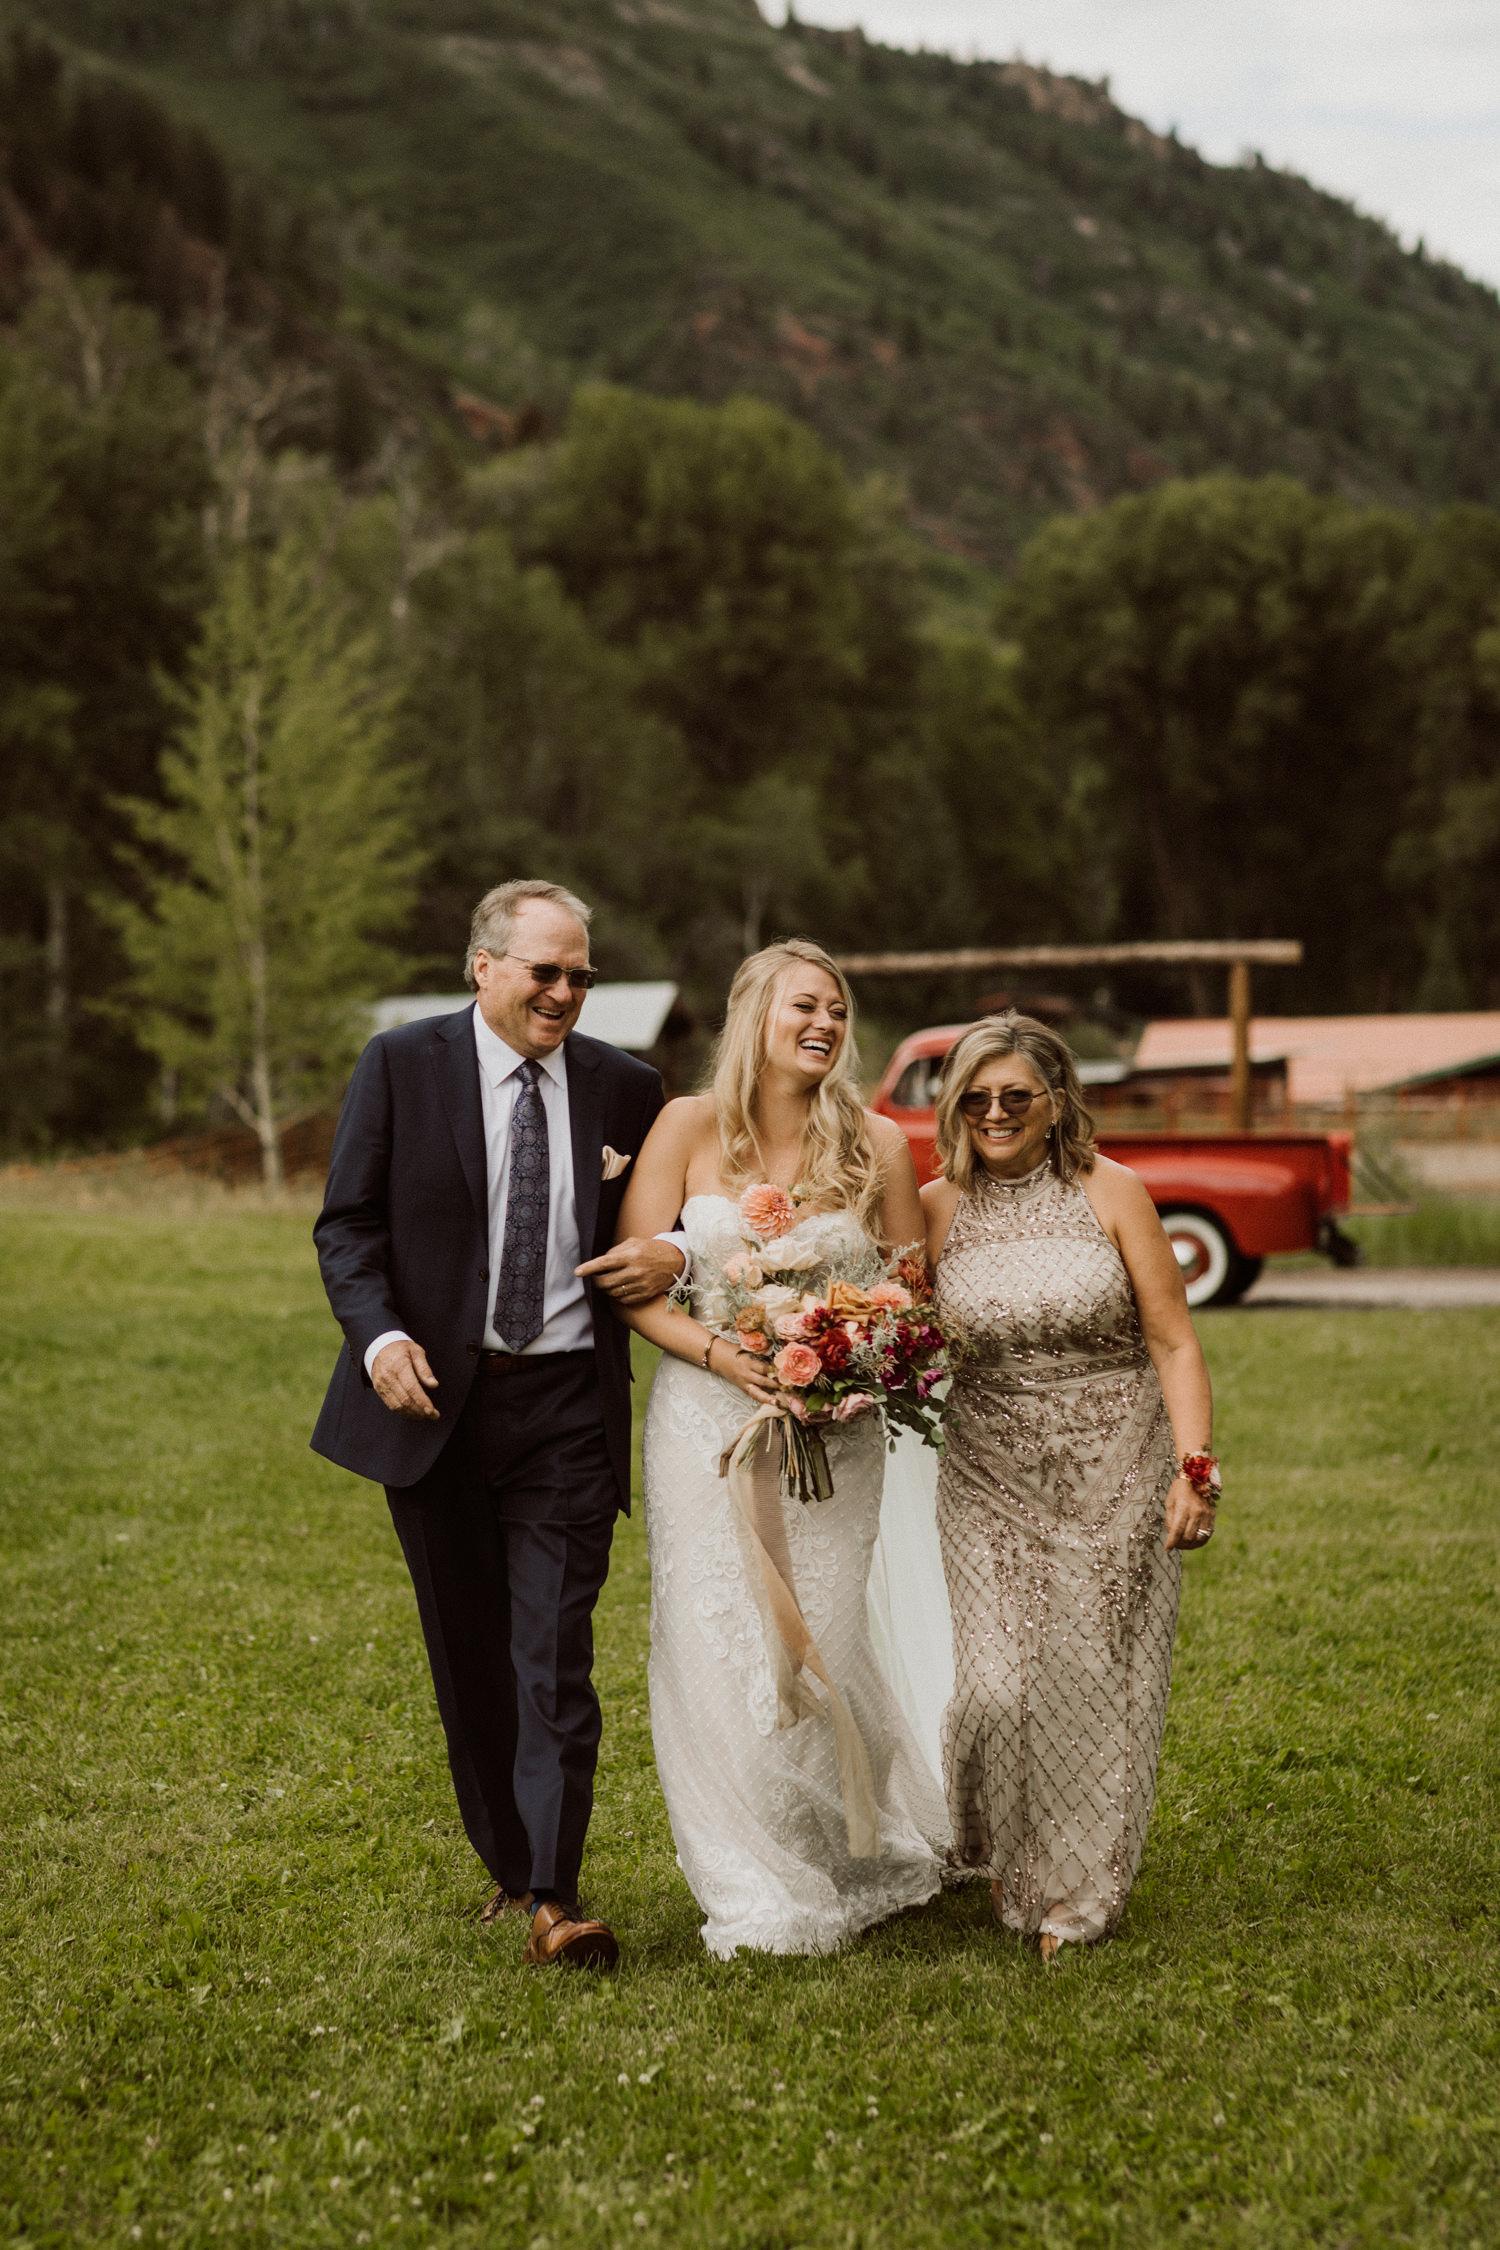 11_bohemian-wedding-in-aspen-colorado-14.jpg